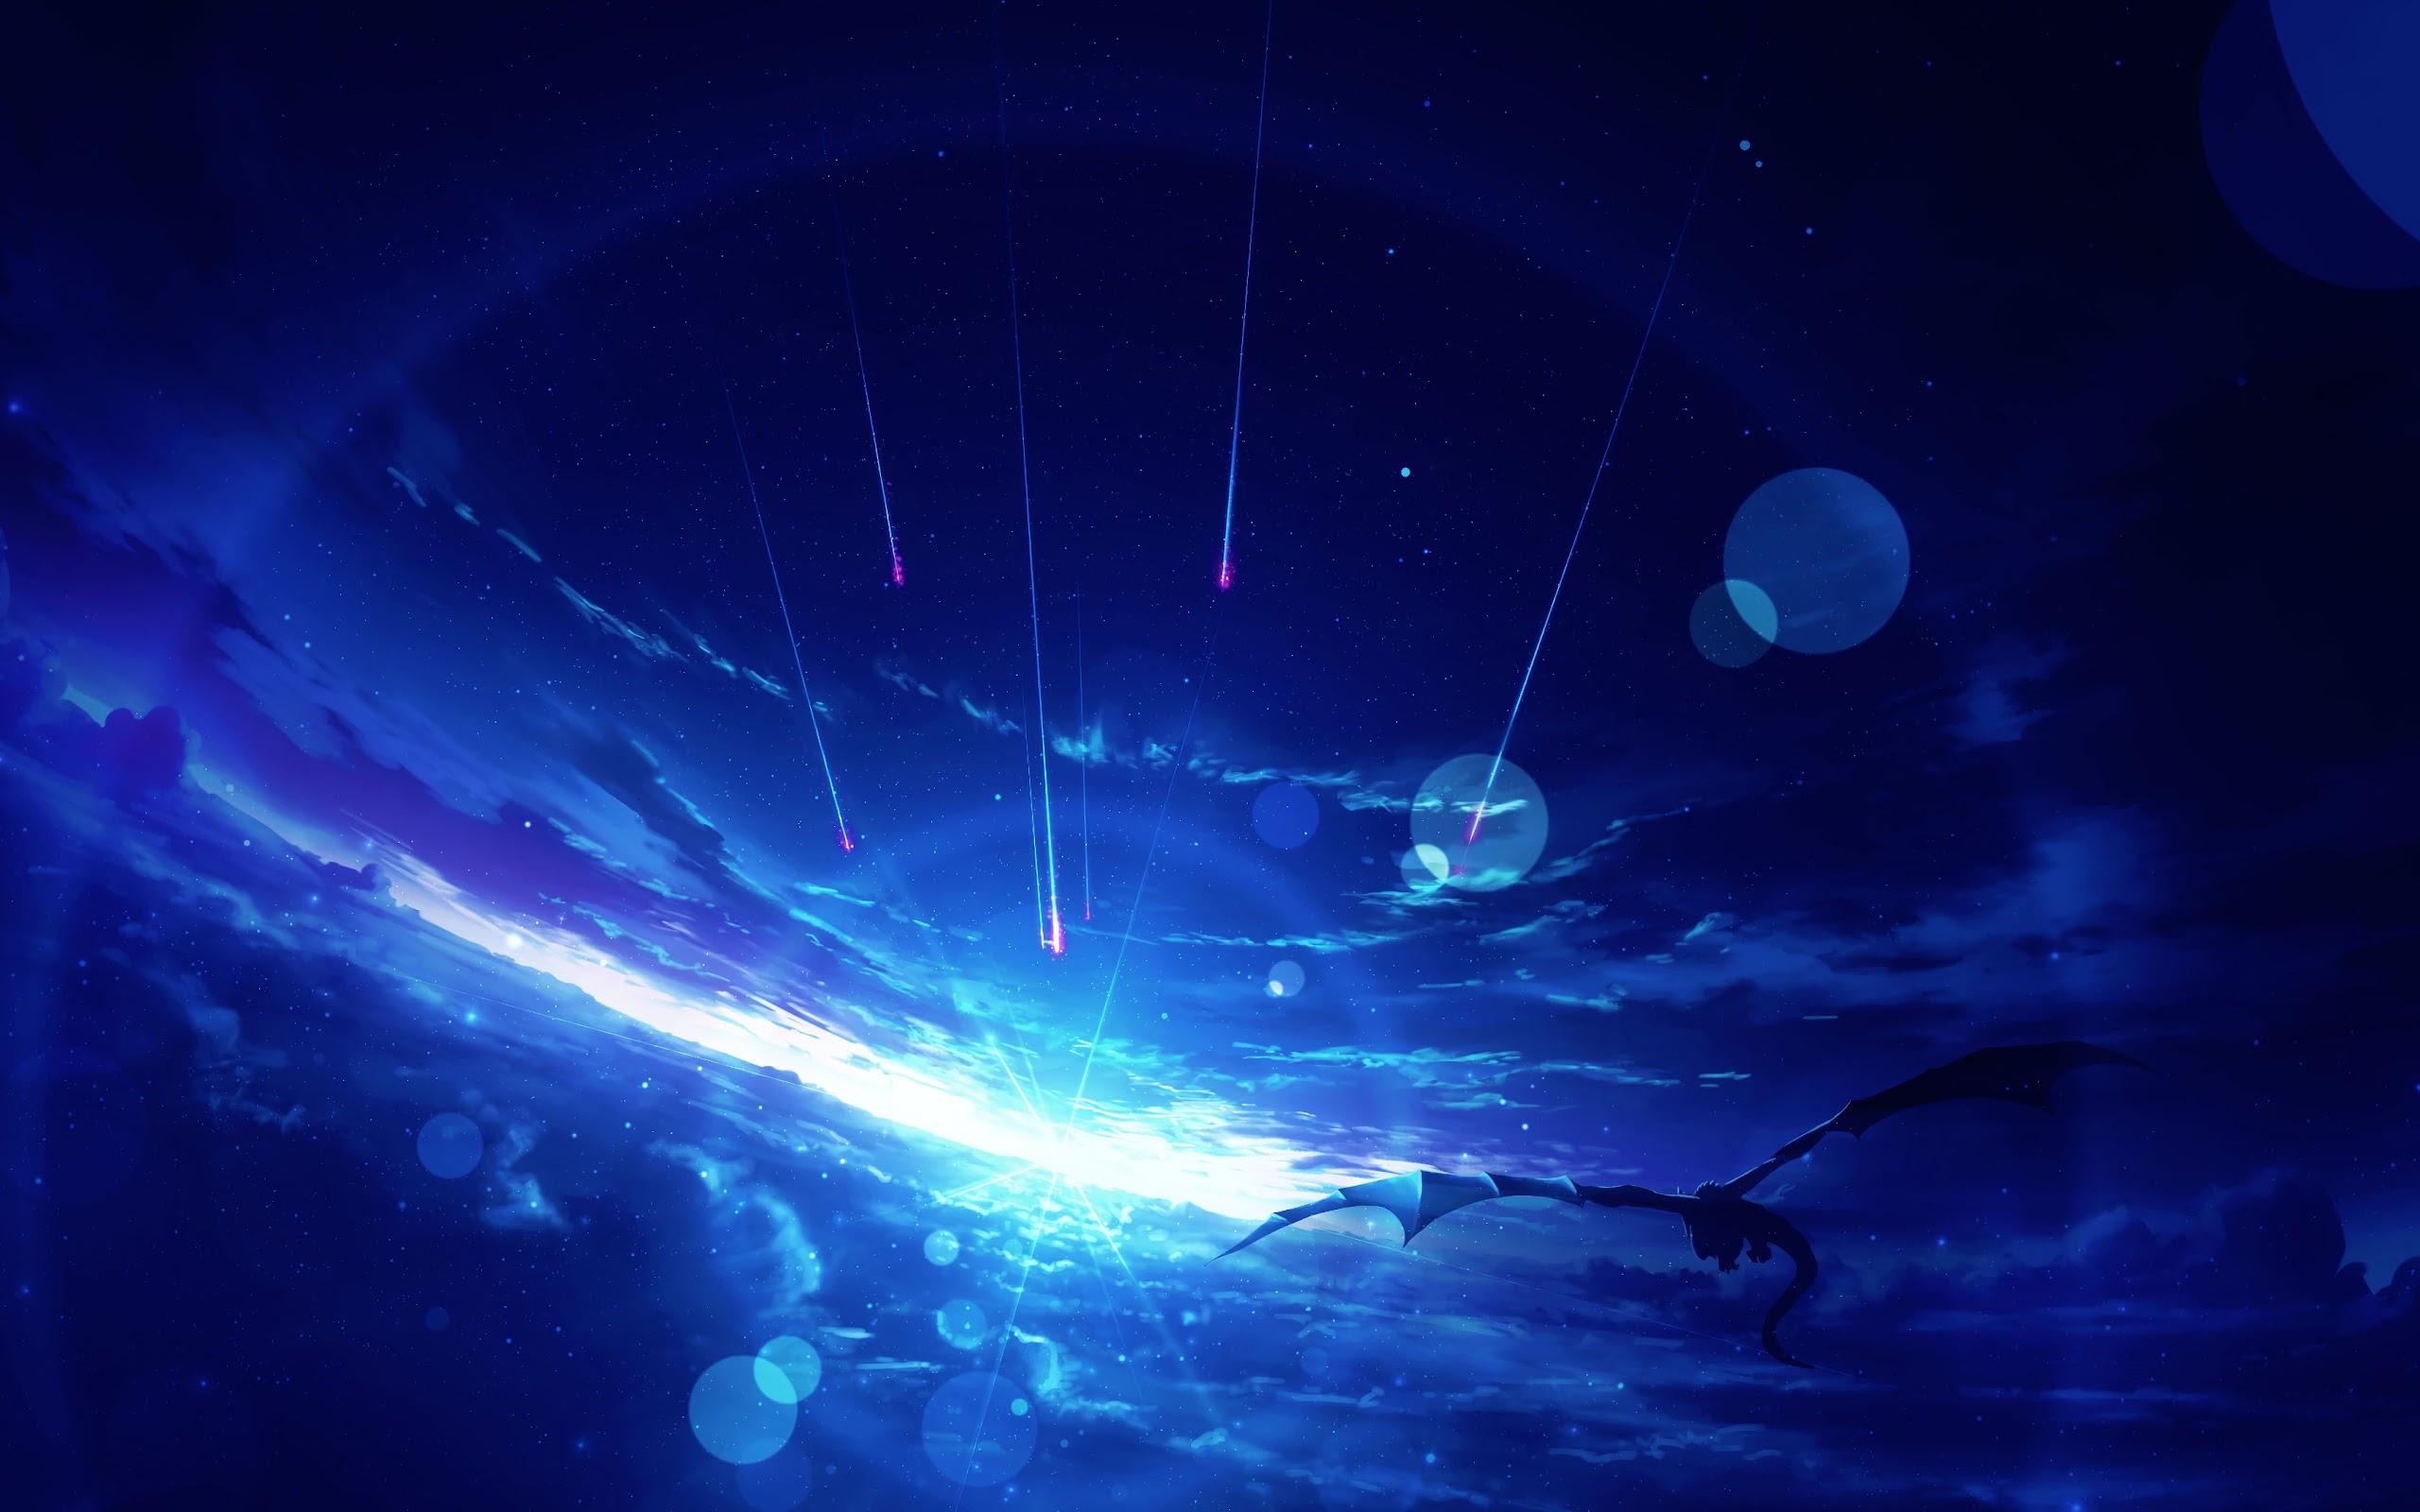 Fantasy Flying Dragon Sunrise Sky Clouds Anime 4k Wallpaper 136